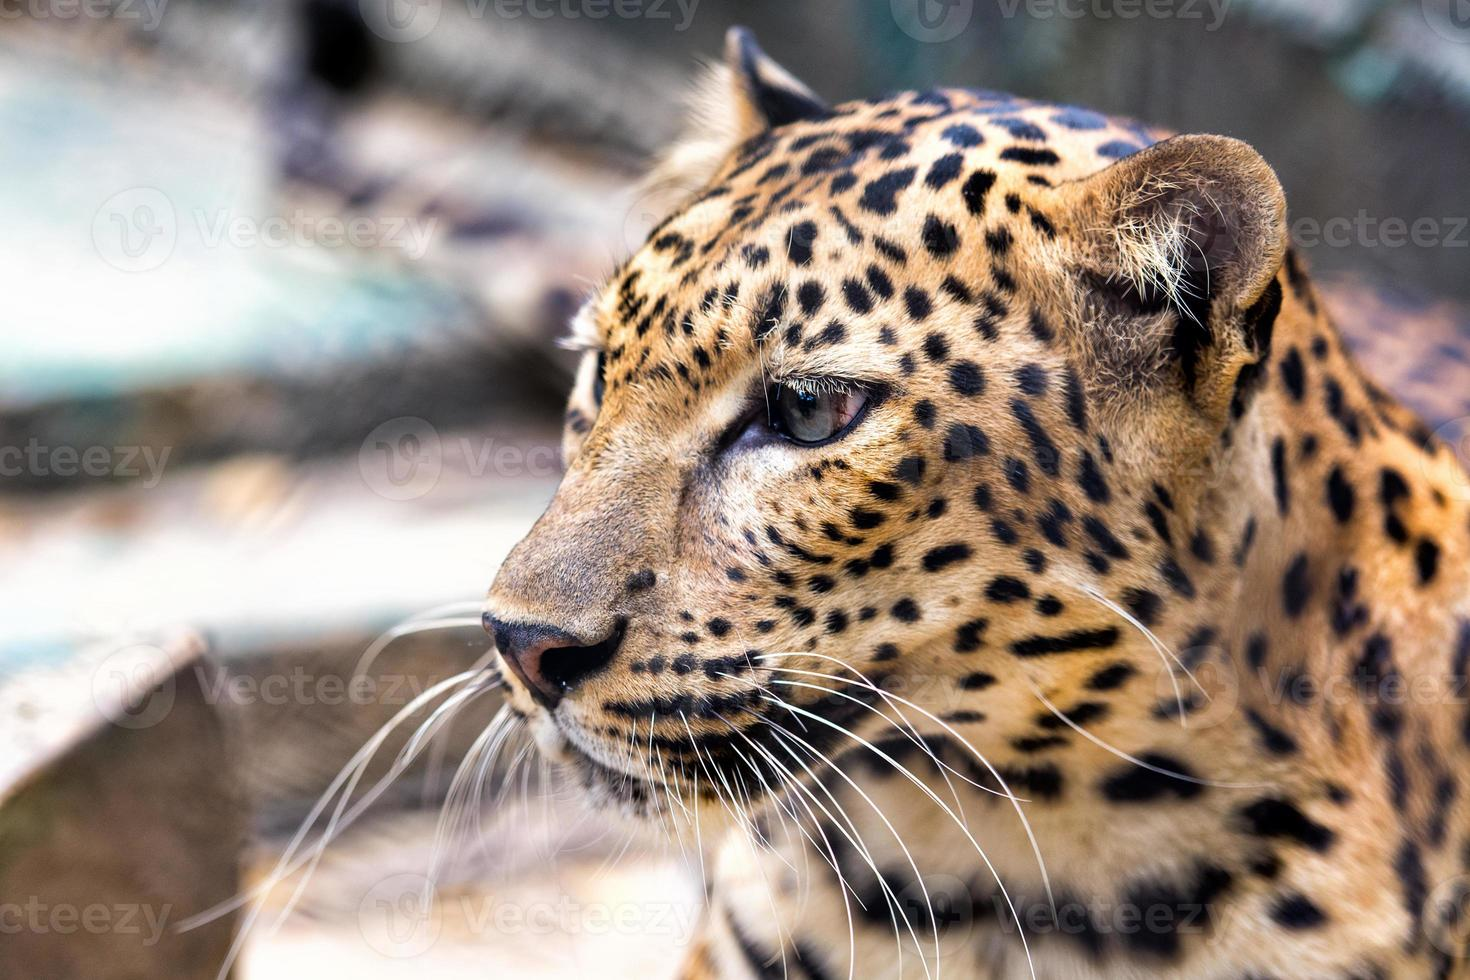 Panther hautnah foto